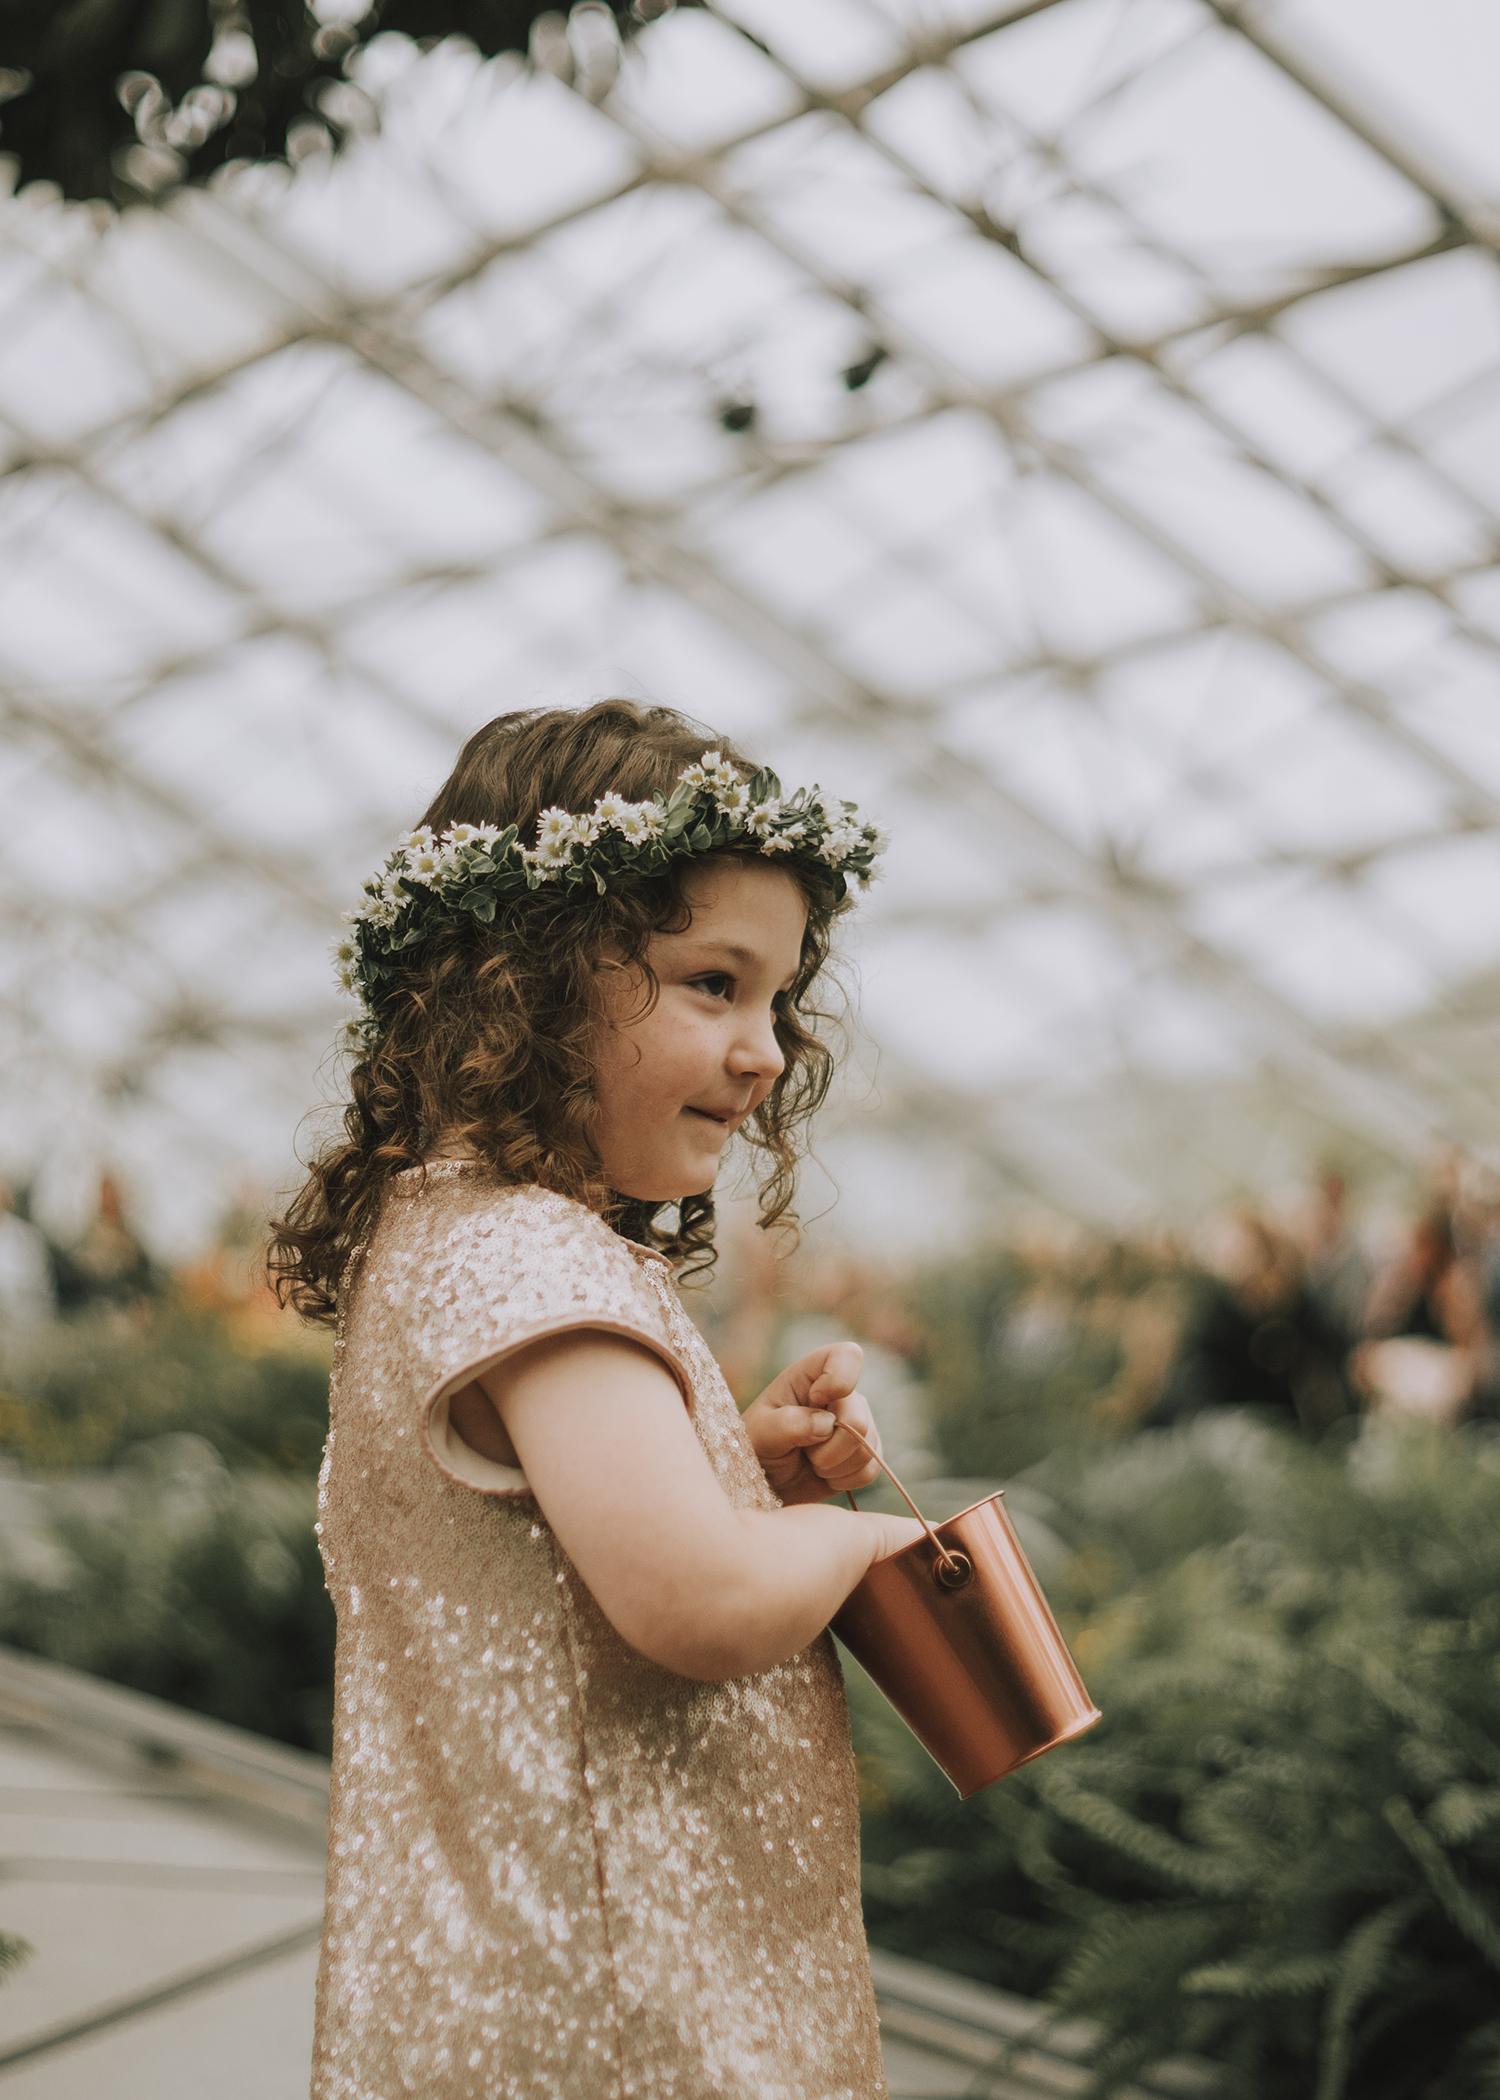 Foellinger-Freimann Botanical Conservatory indianapolis indiana hannah bergman Photography flower girl flower crown